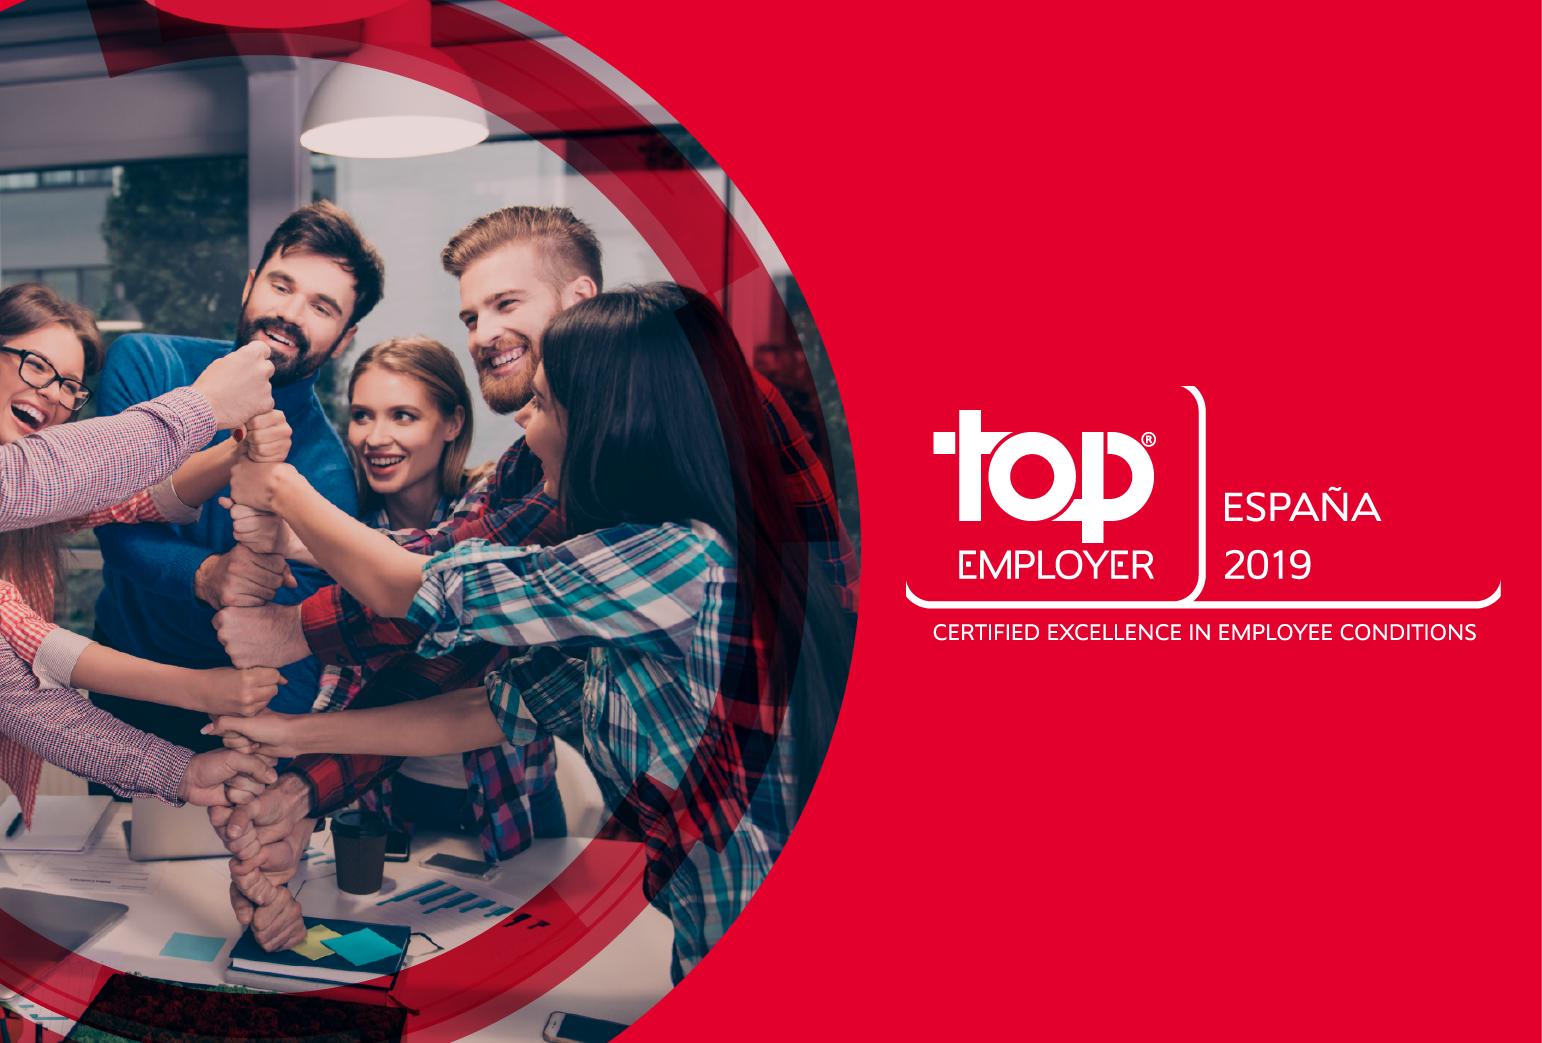 ALTEN SPAIN es certificada como Top Employer 2019